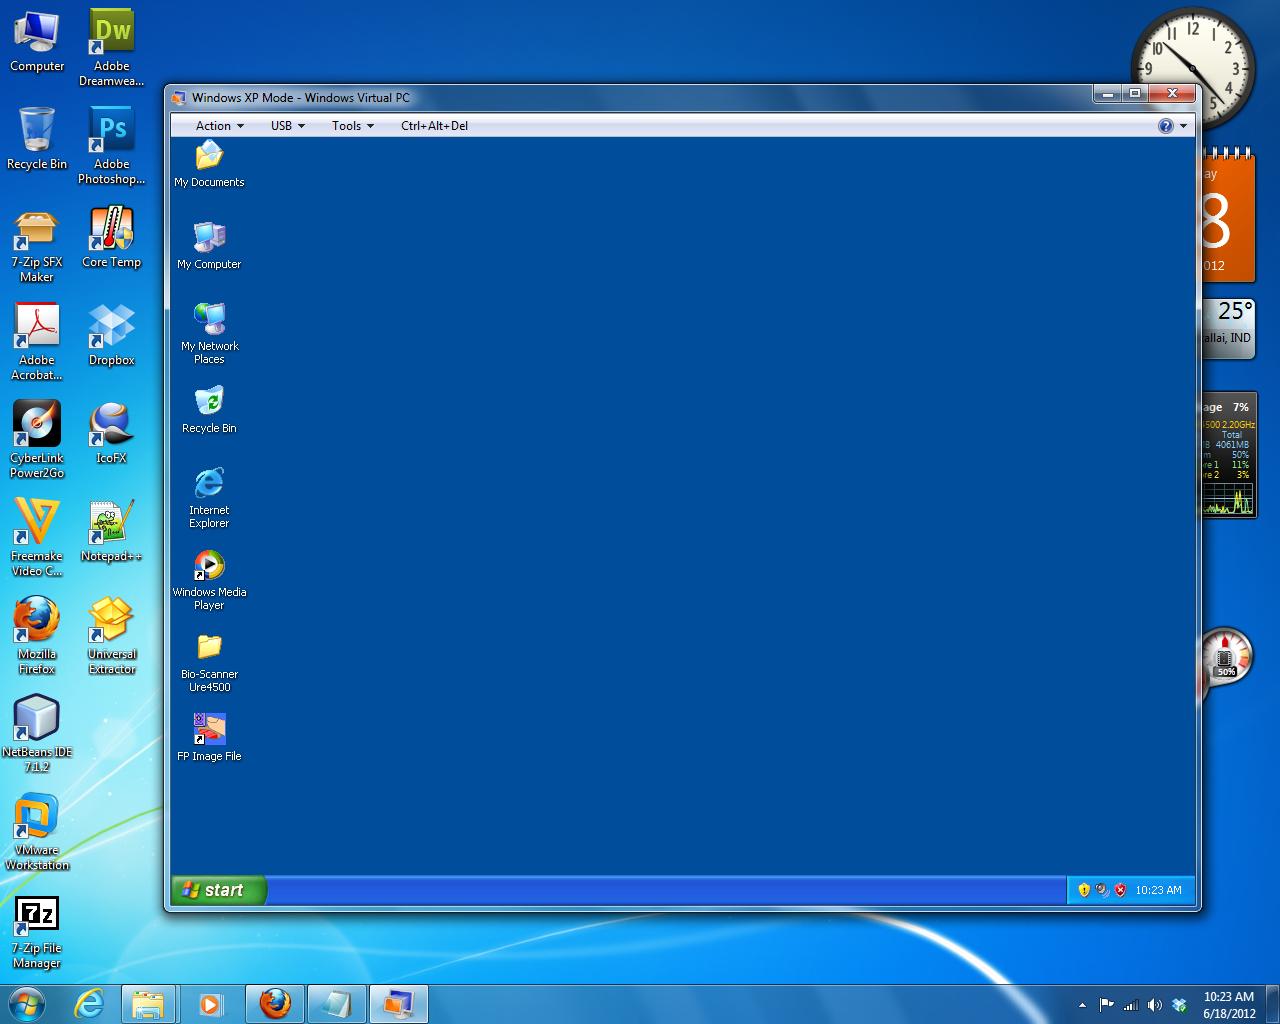 download windows xp mode windows 7